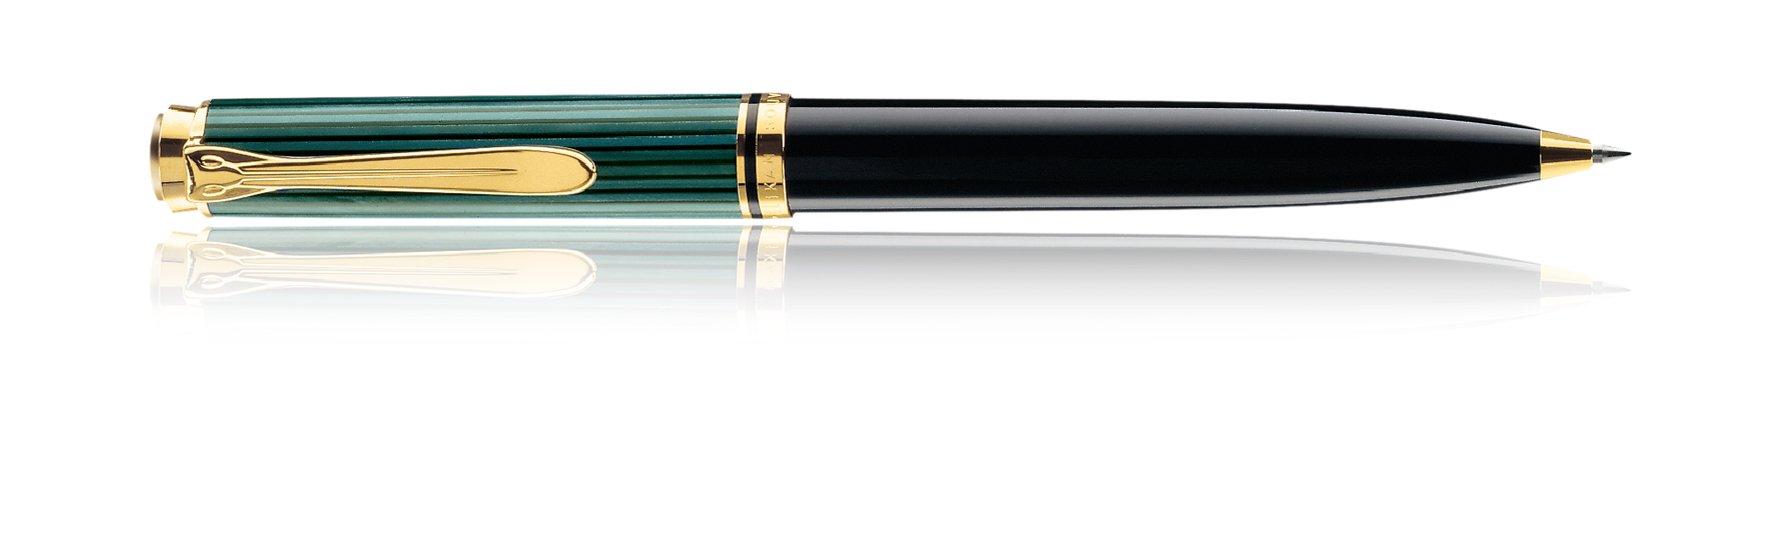 PELIKAN Souveran Ballpoint, Black/Green (996991)